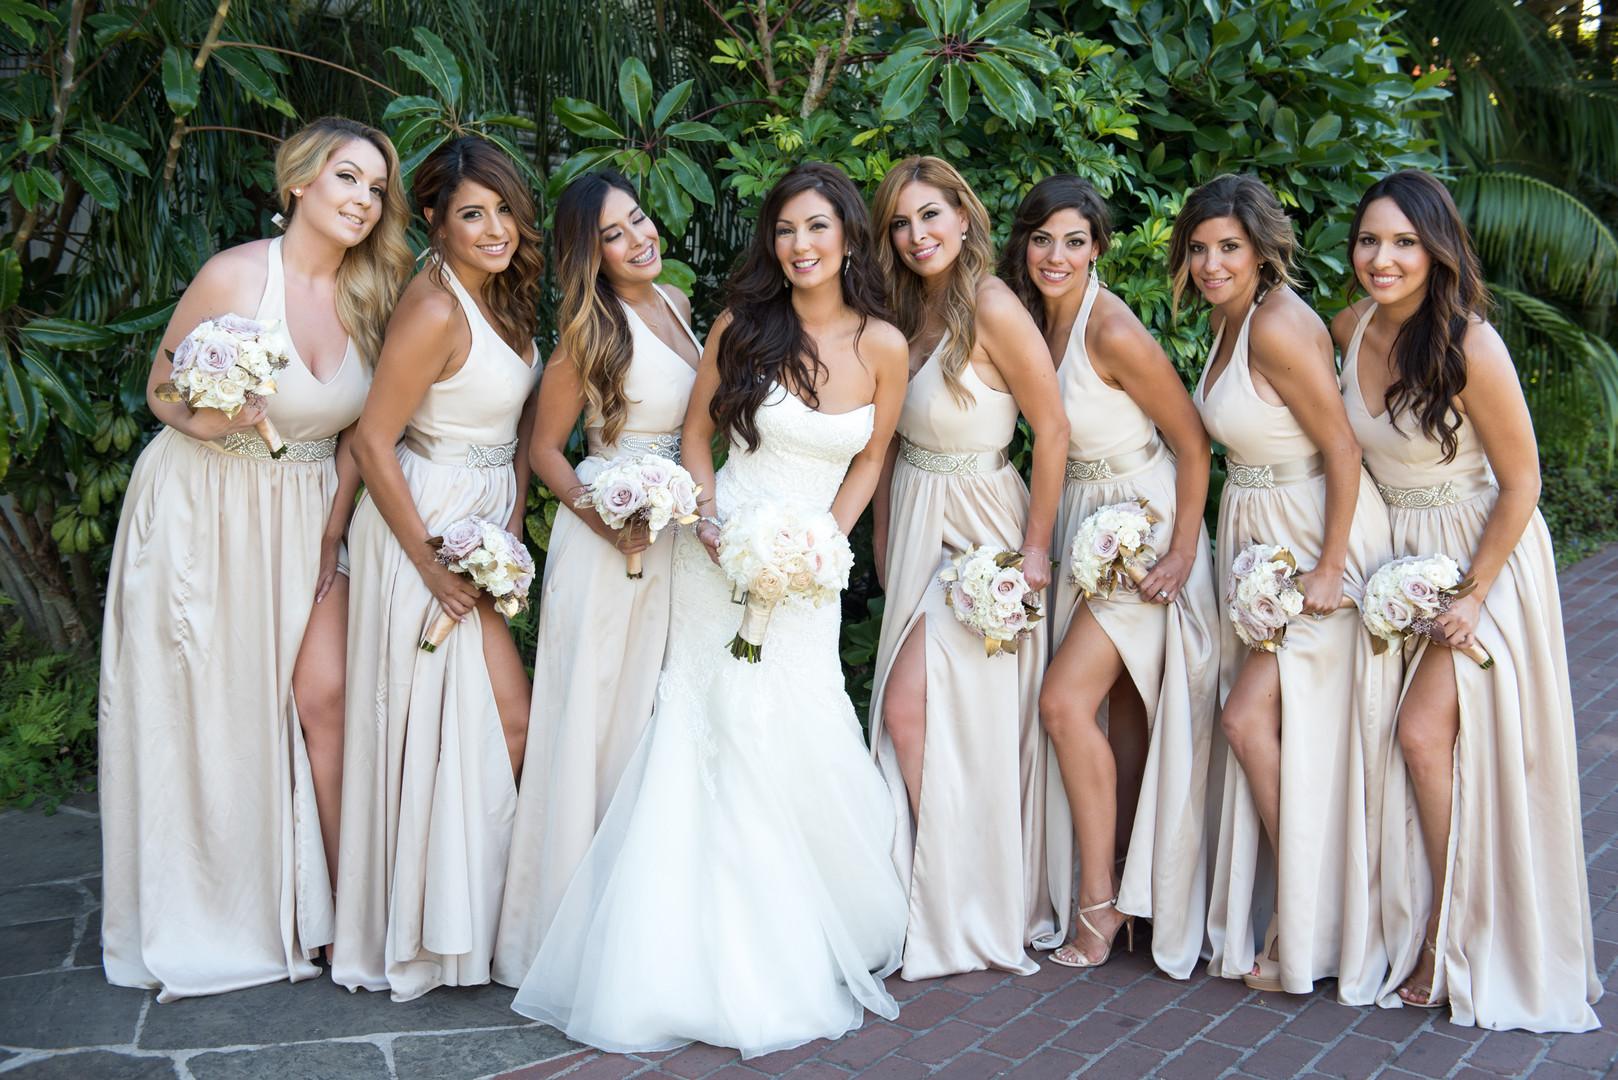 www.santabarbarawedding.com   The Big Affair   Four Seasons The Biltmore Santa Barbara   Asiel Designs   Bridal Party